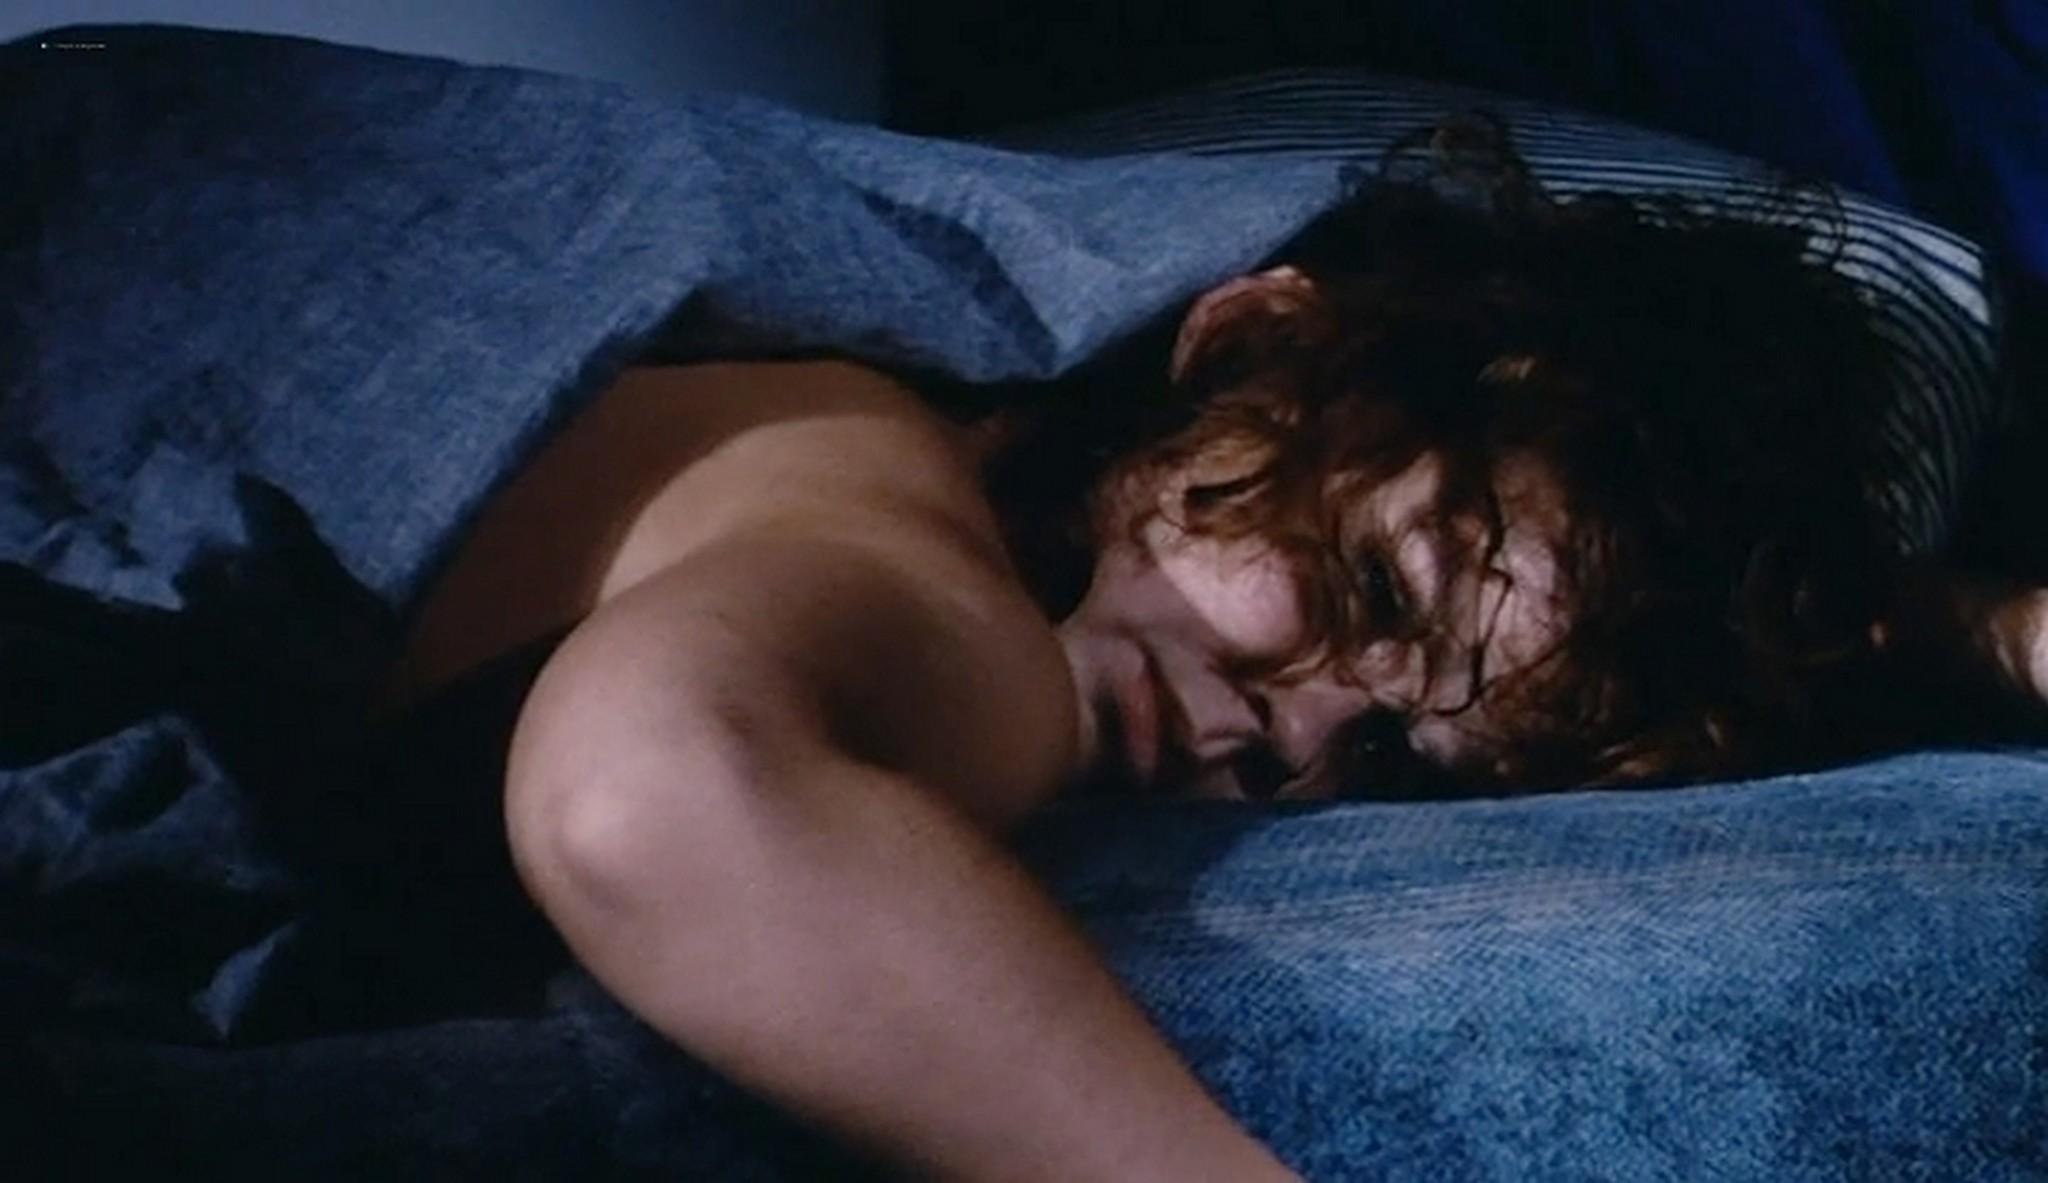 Linda Blair nude sex Sylvia Kristel and others nude too Red Heat 1985 VHSRip 14